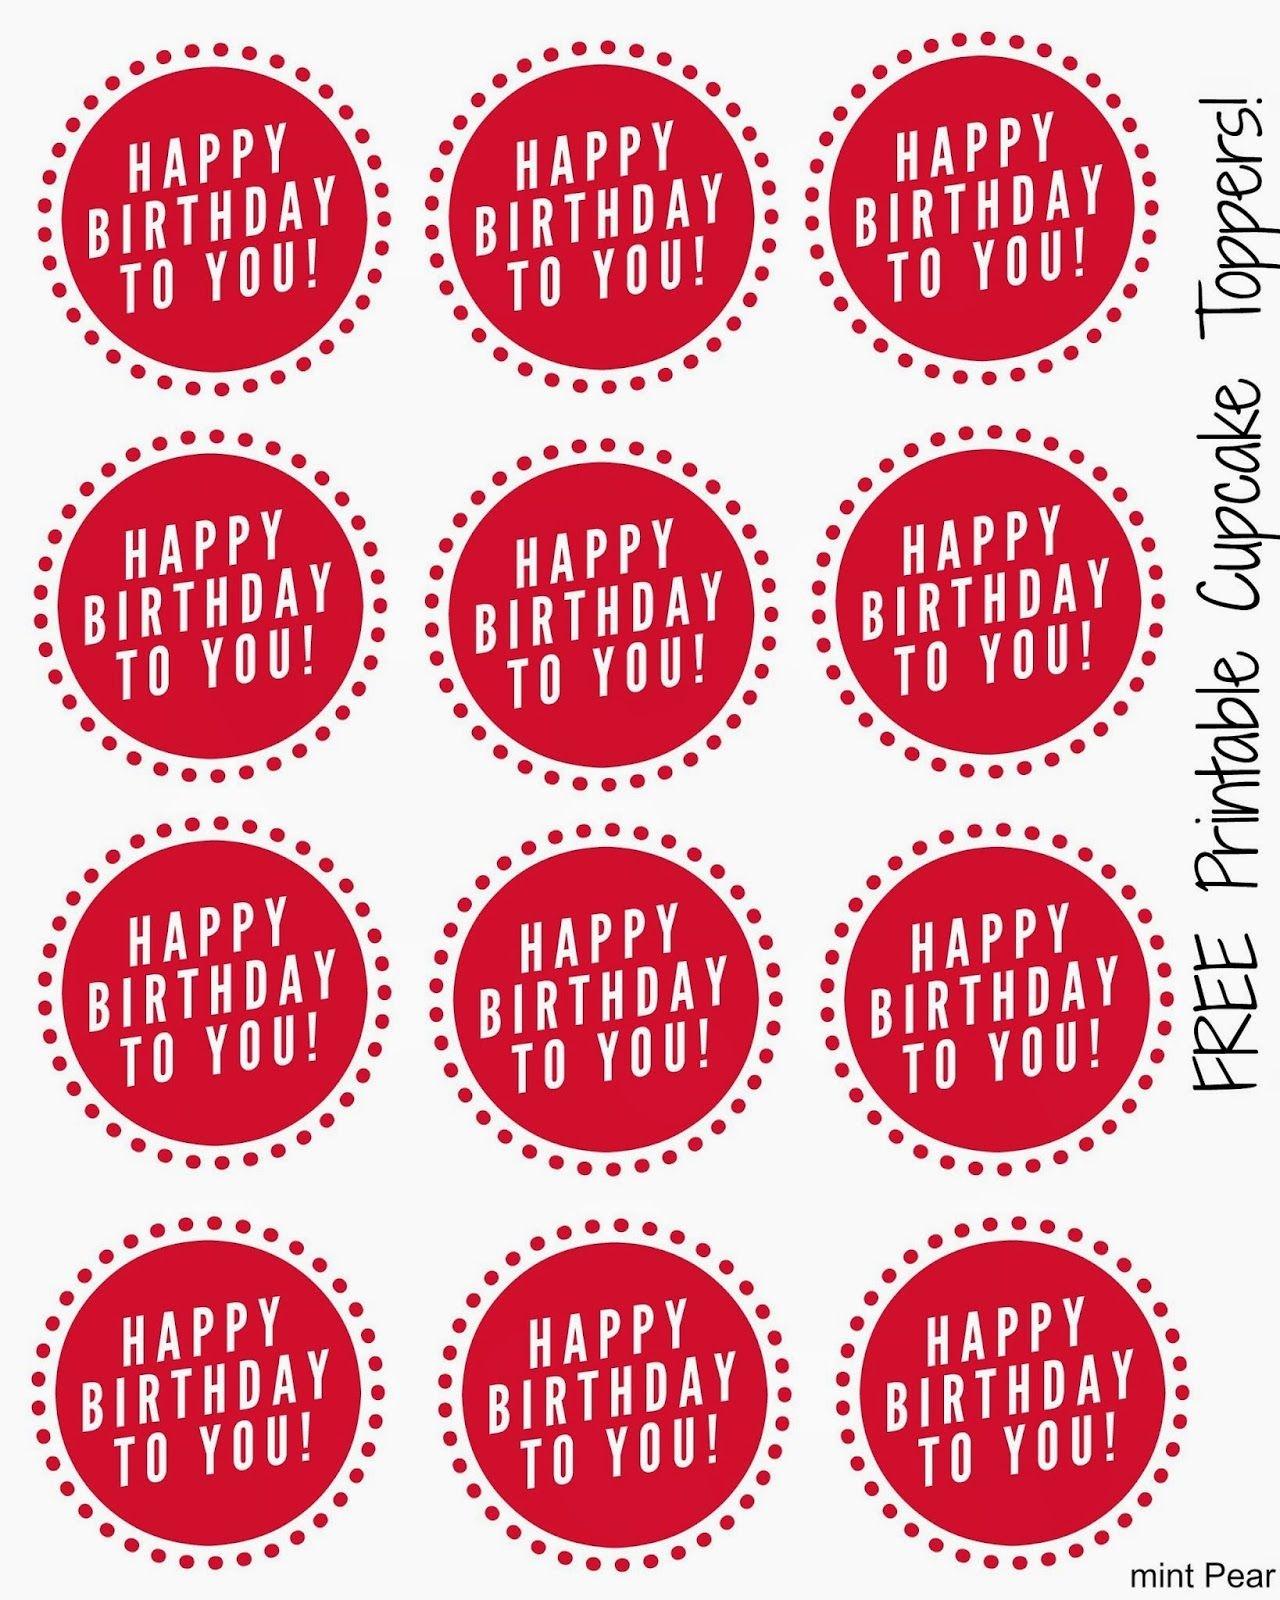 Free Printable Cupcake Toppers   Free Stuff!   Cupcake Toppers Free - Free Printable Cupcake Toppers